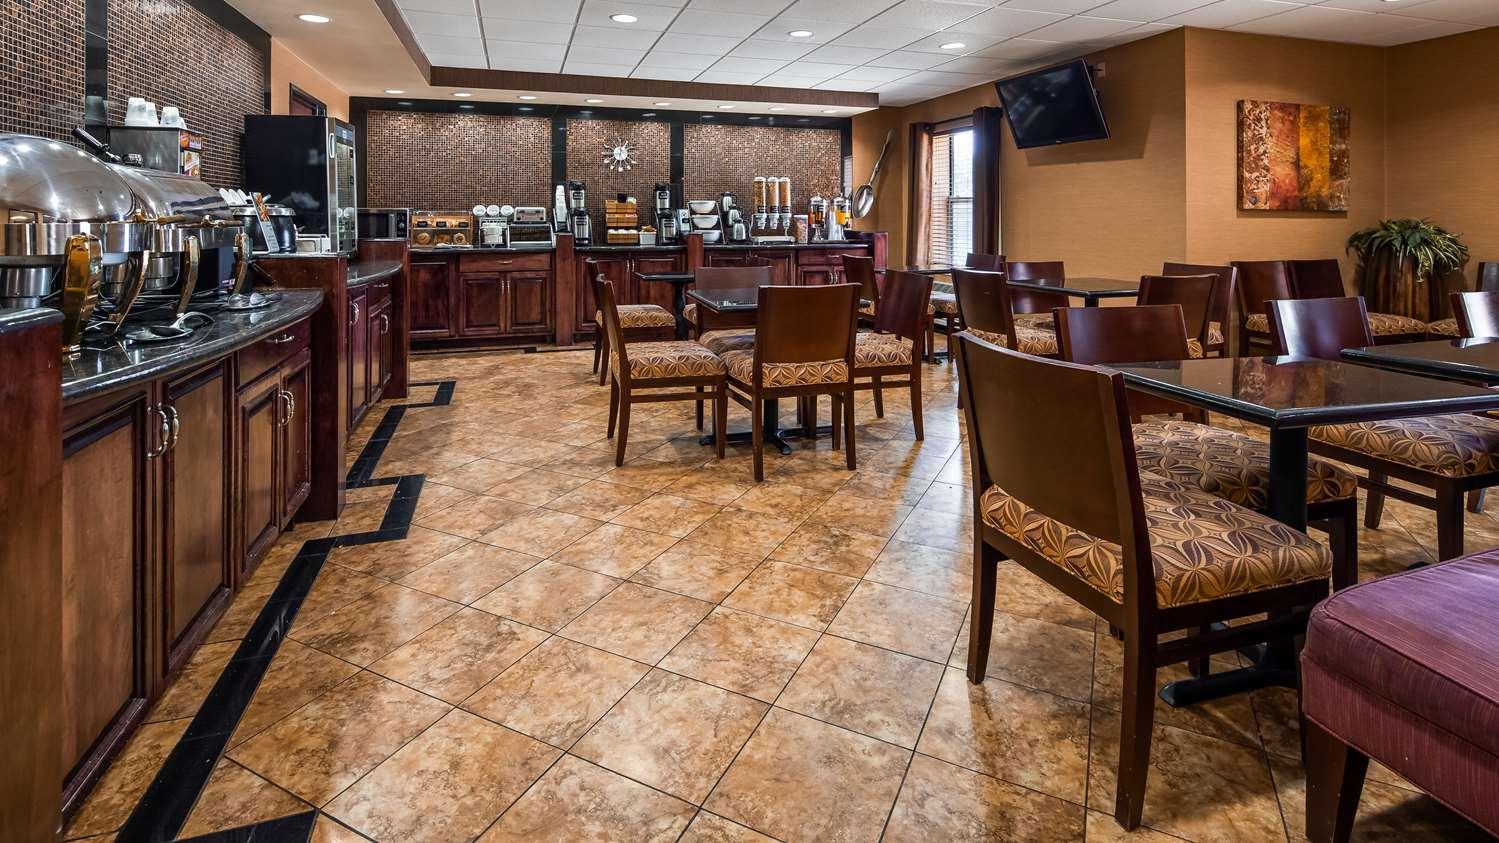 Restaurant - Best Western Plus Midwest Inn & Suites Salina